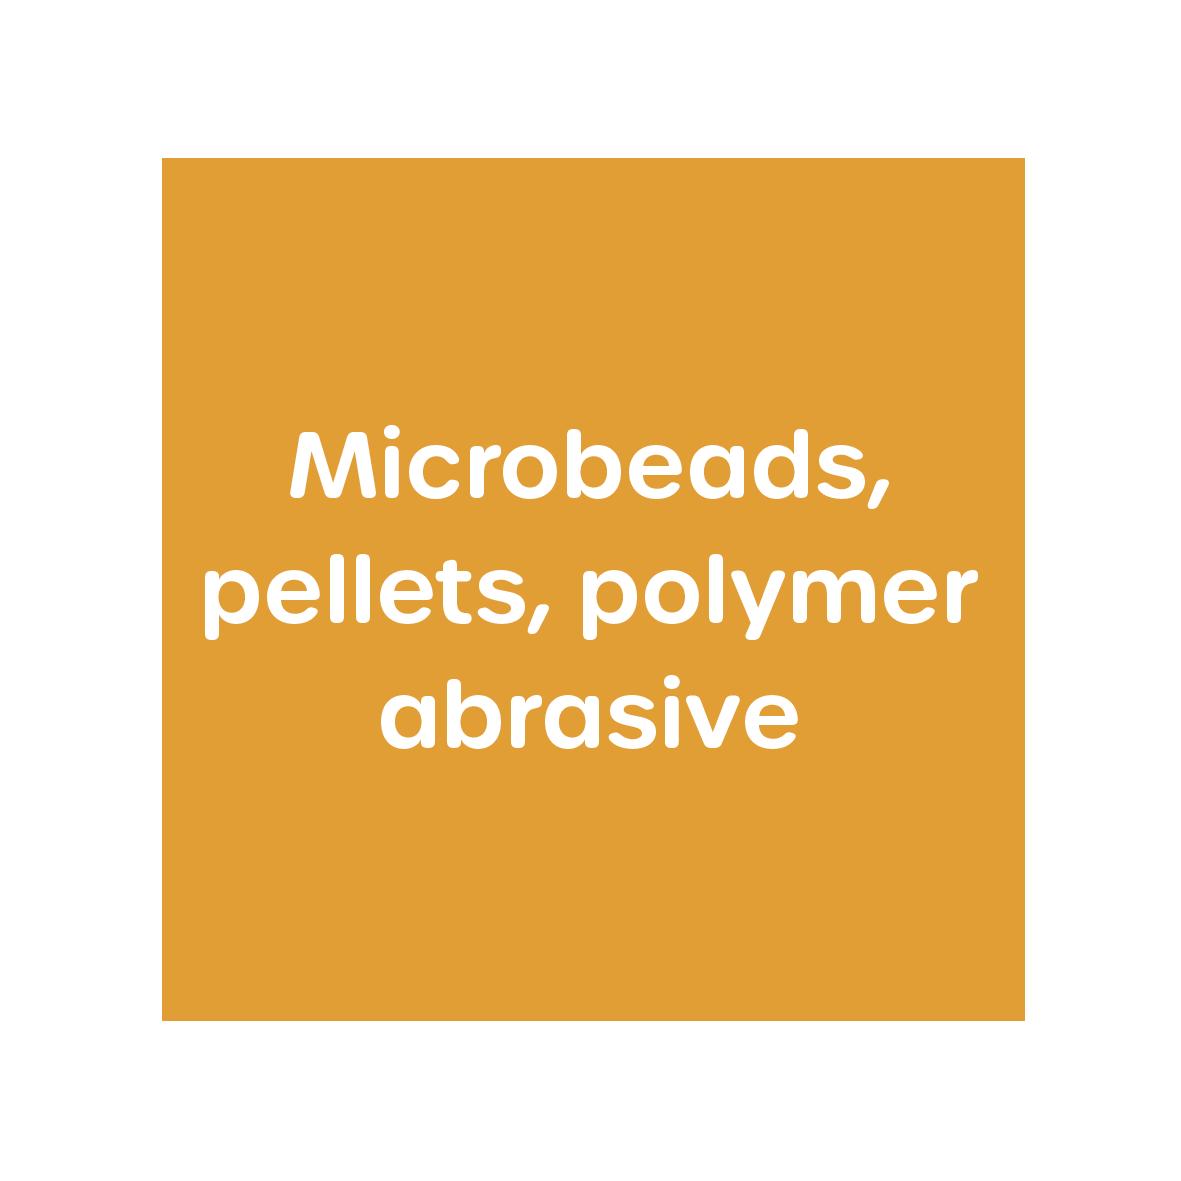 Microbeads Microplastics